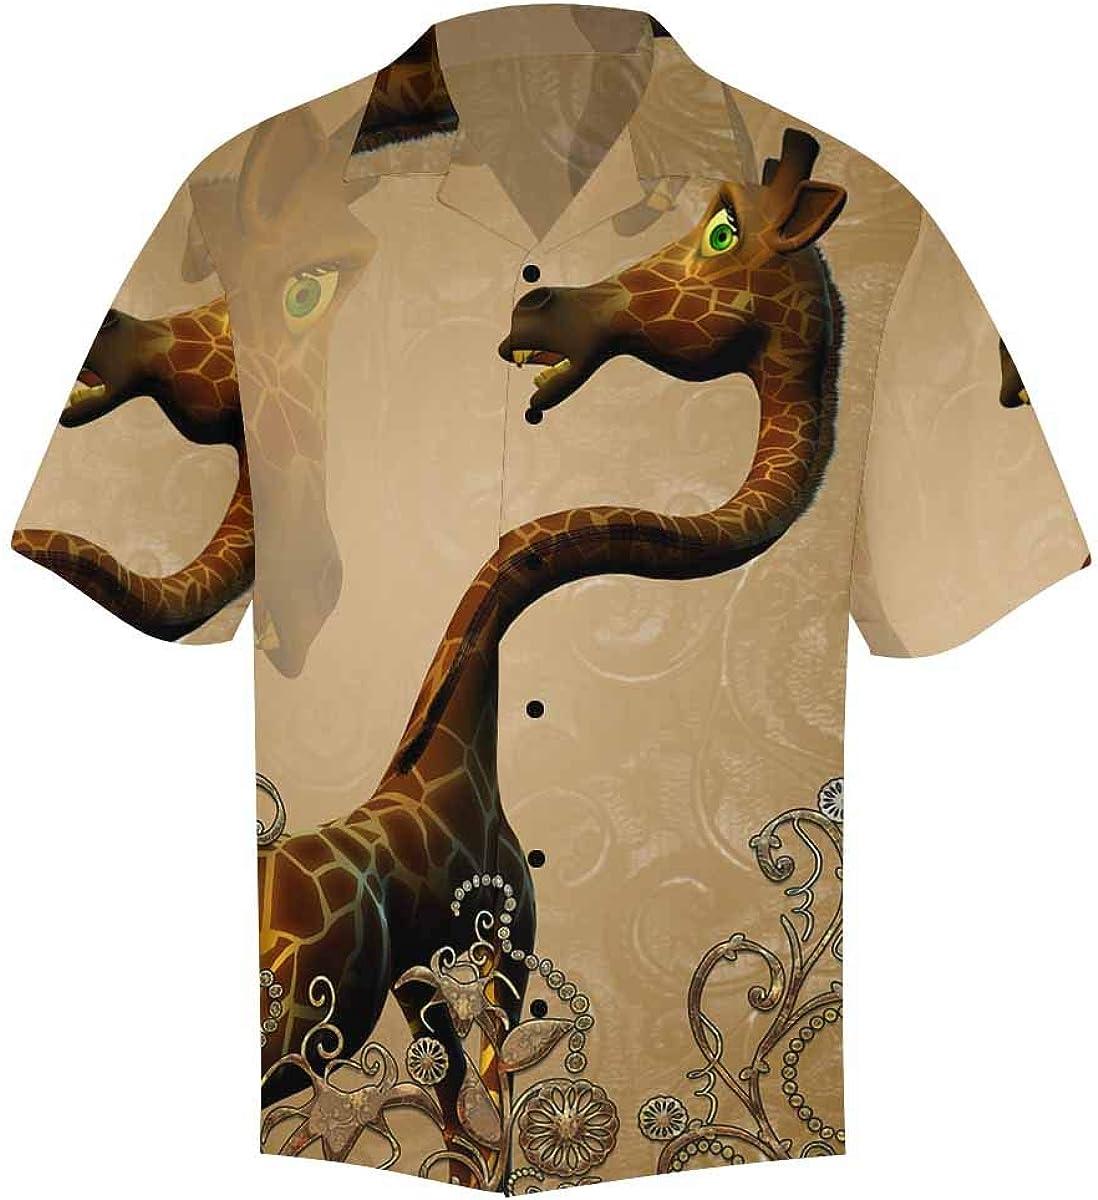 Challenge the lowest Arlington Mall price of Japan InterestPrint Men's Casual Button Down Hawaiian Short Shi Sleeve